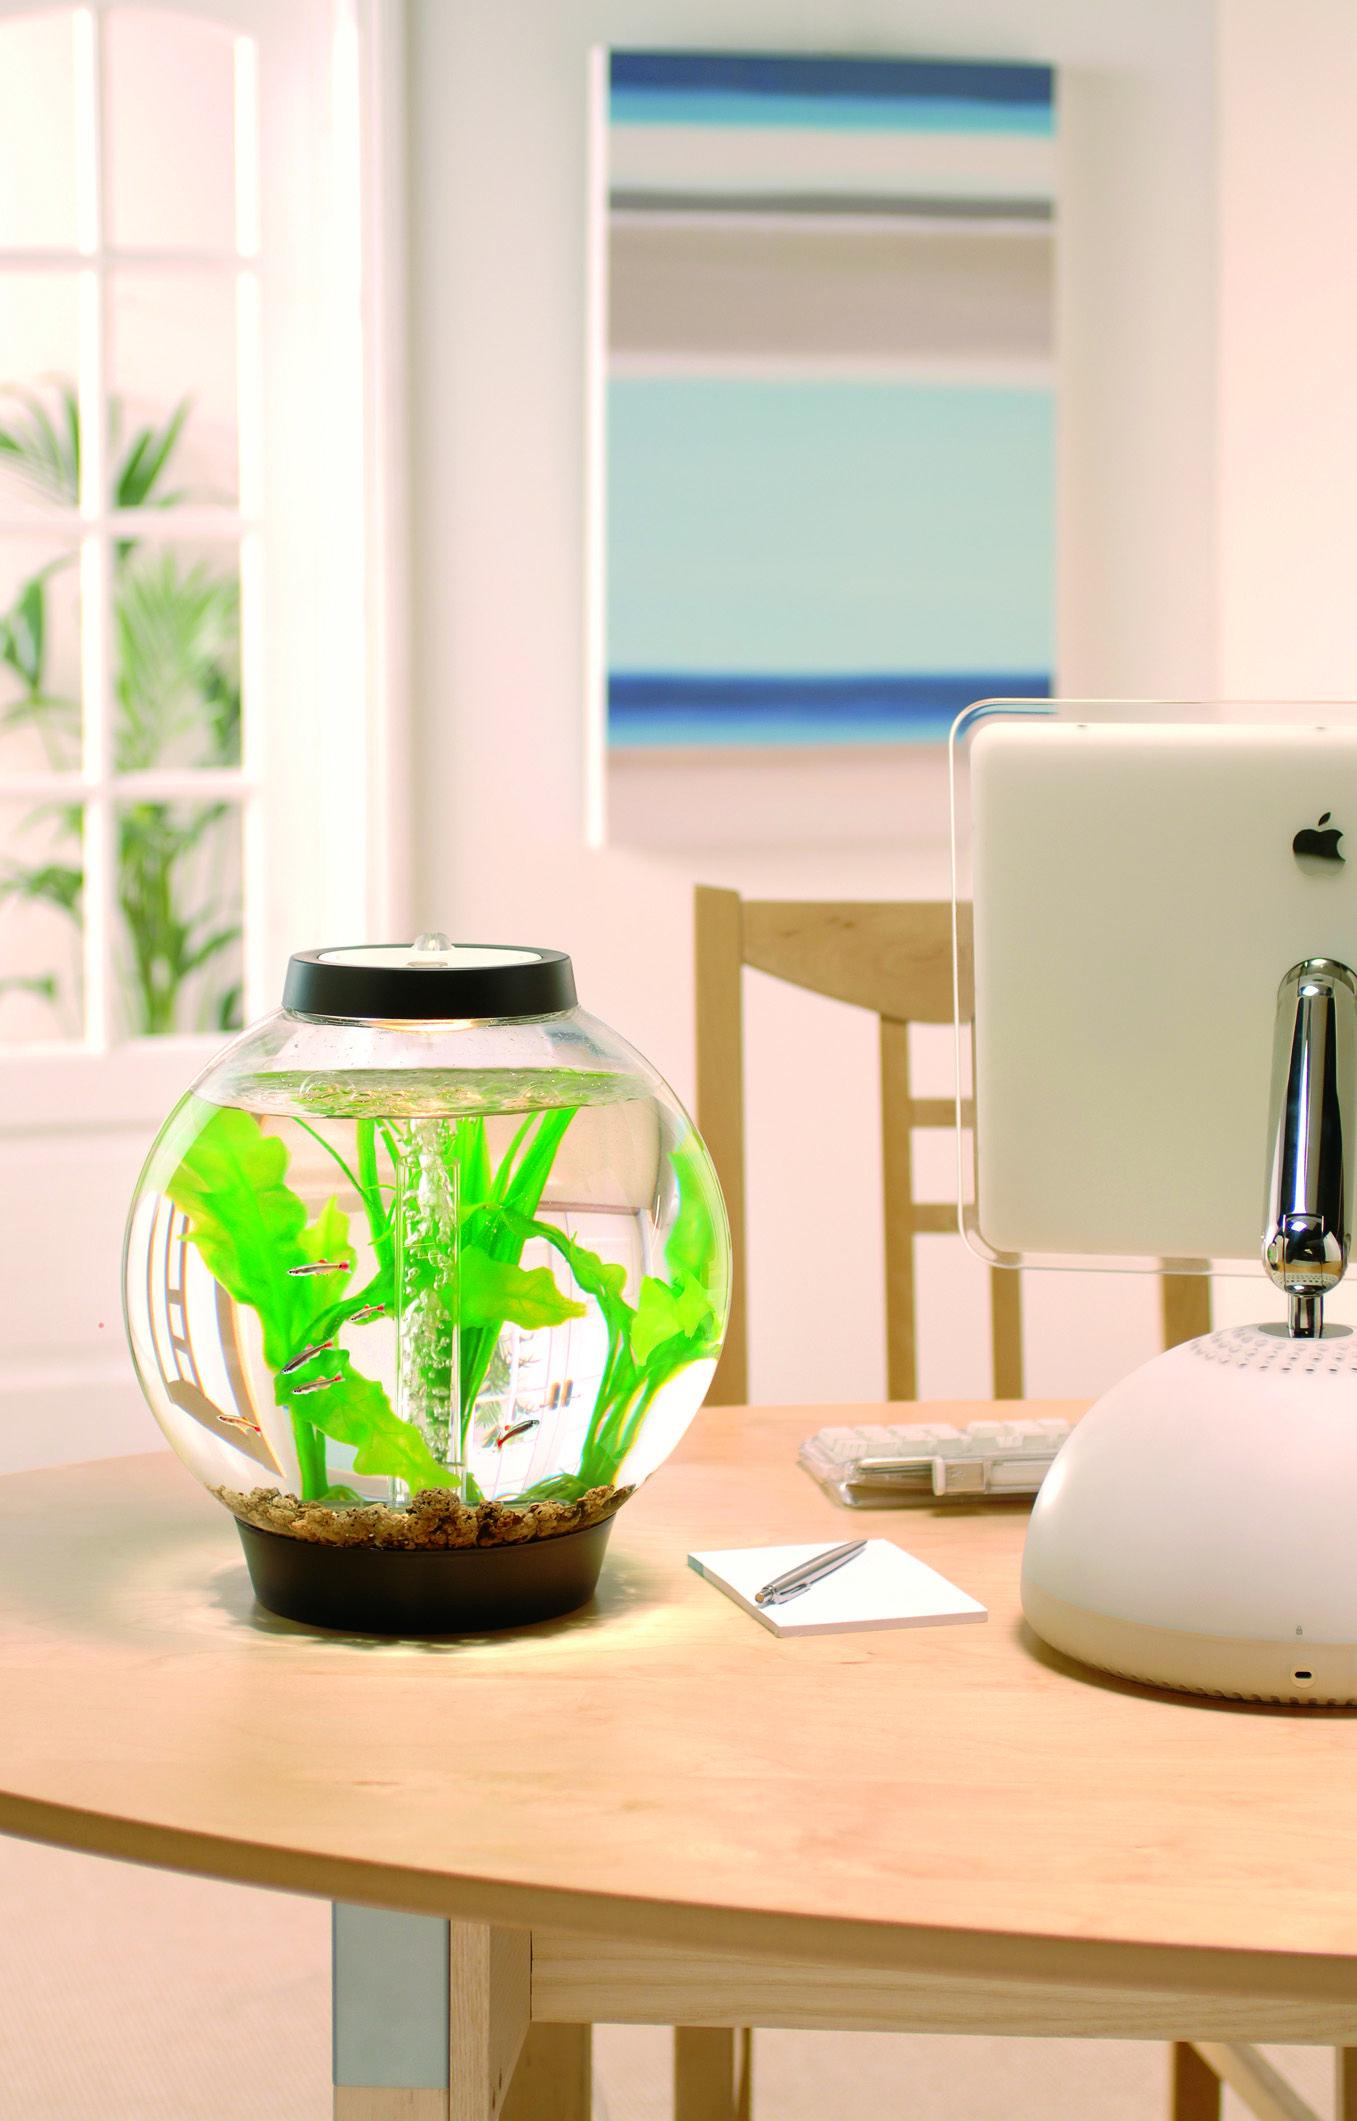 office desk aquarium. Find This Pin And More On Aquariums- Desktop/Betta By Eawilfong. Office Desk Aquarium U